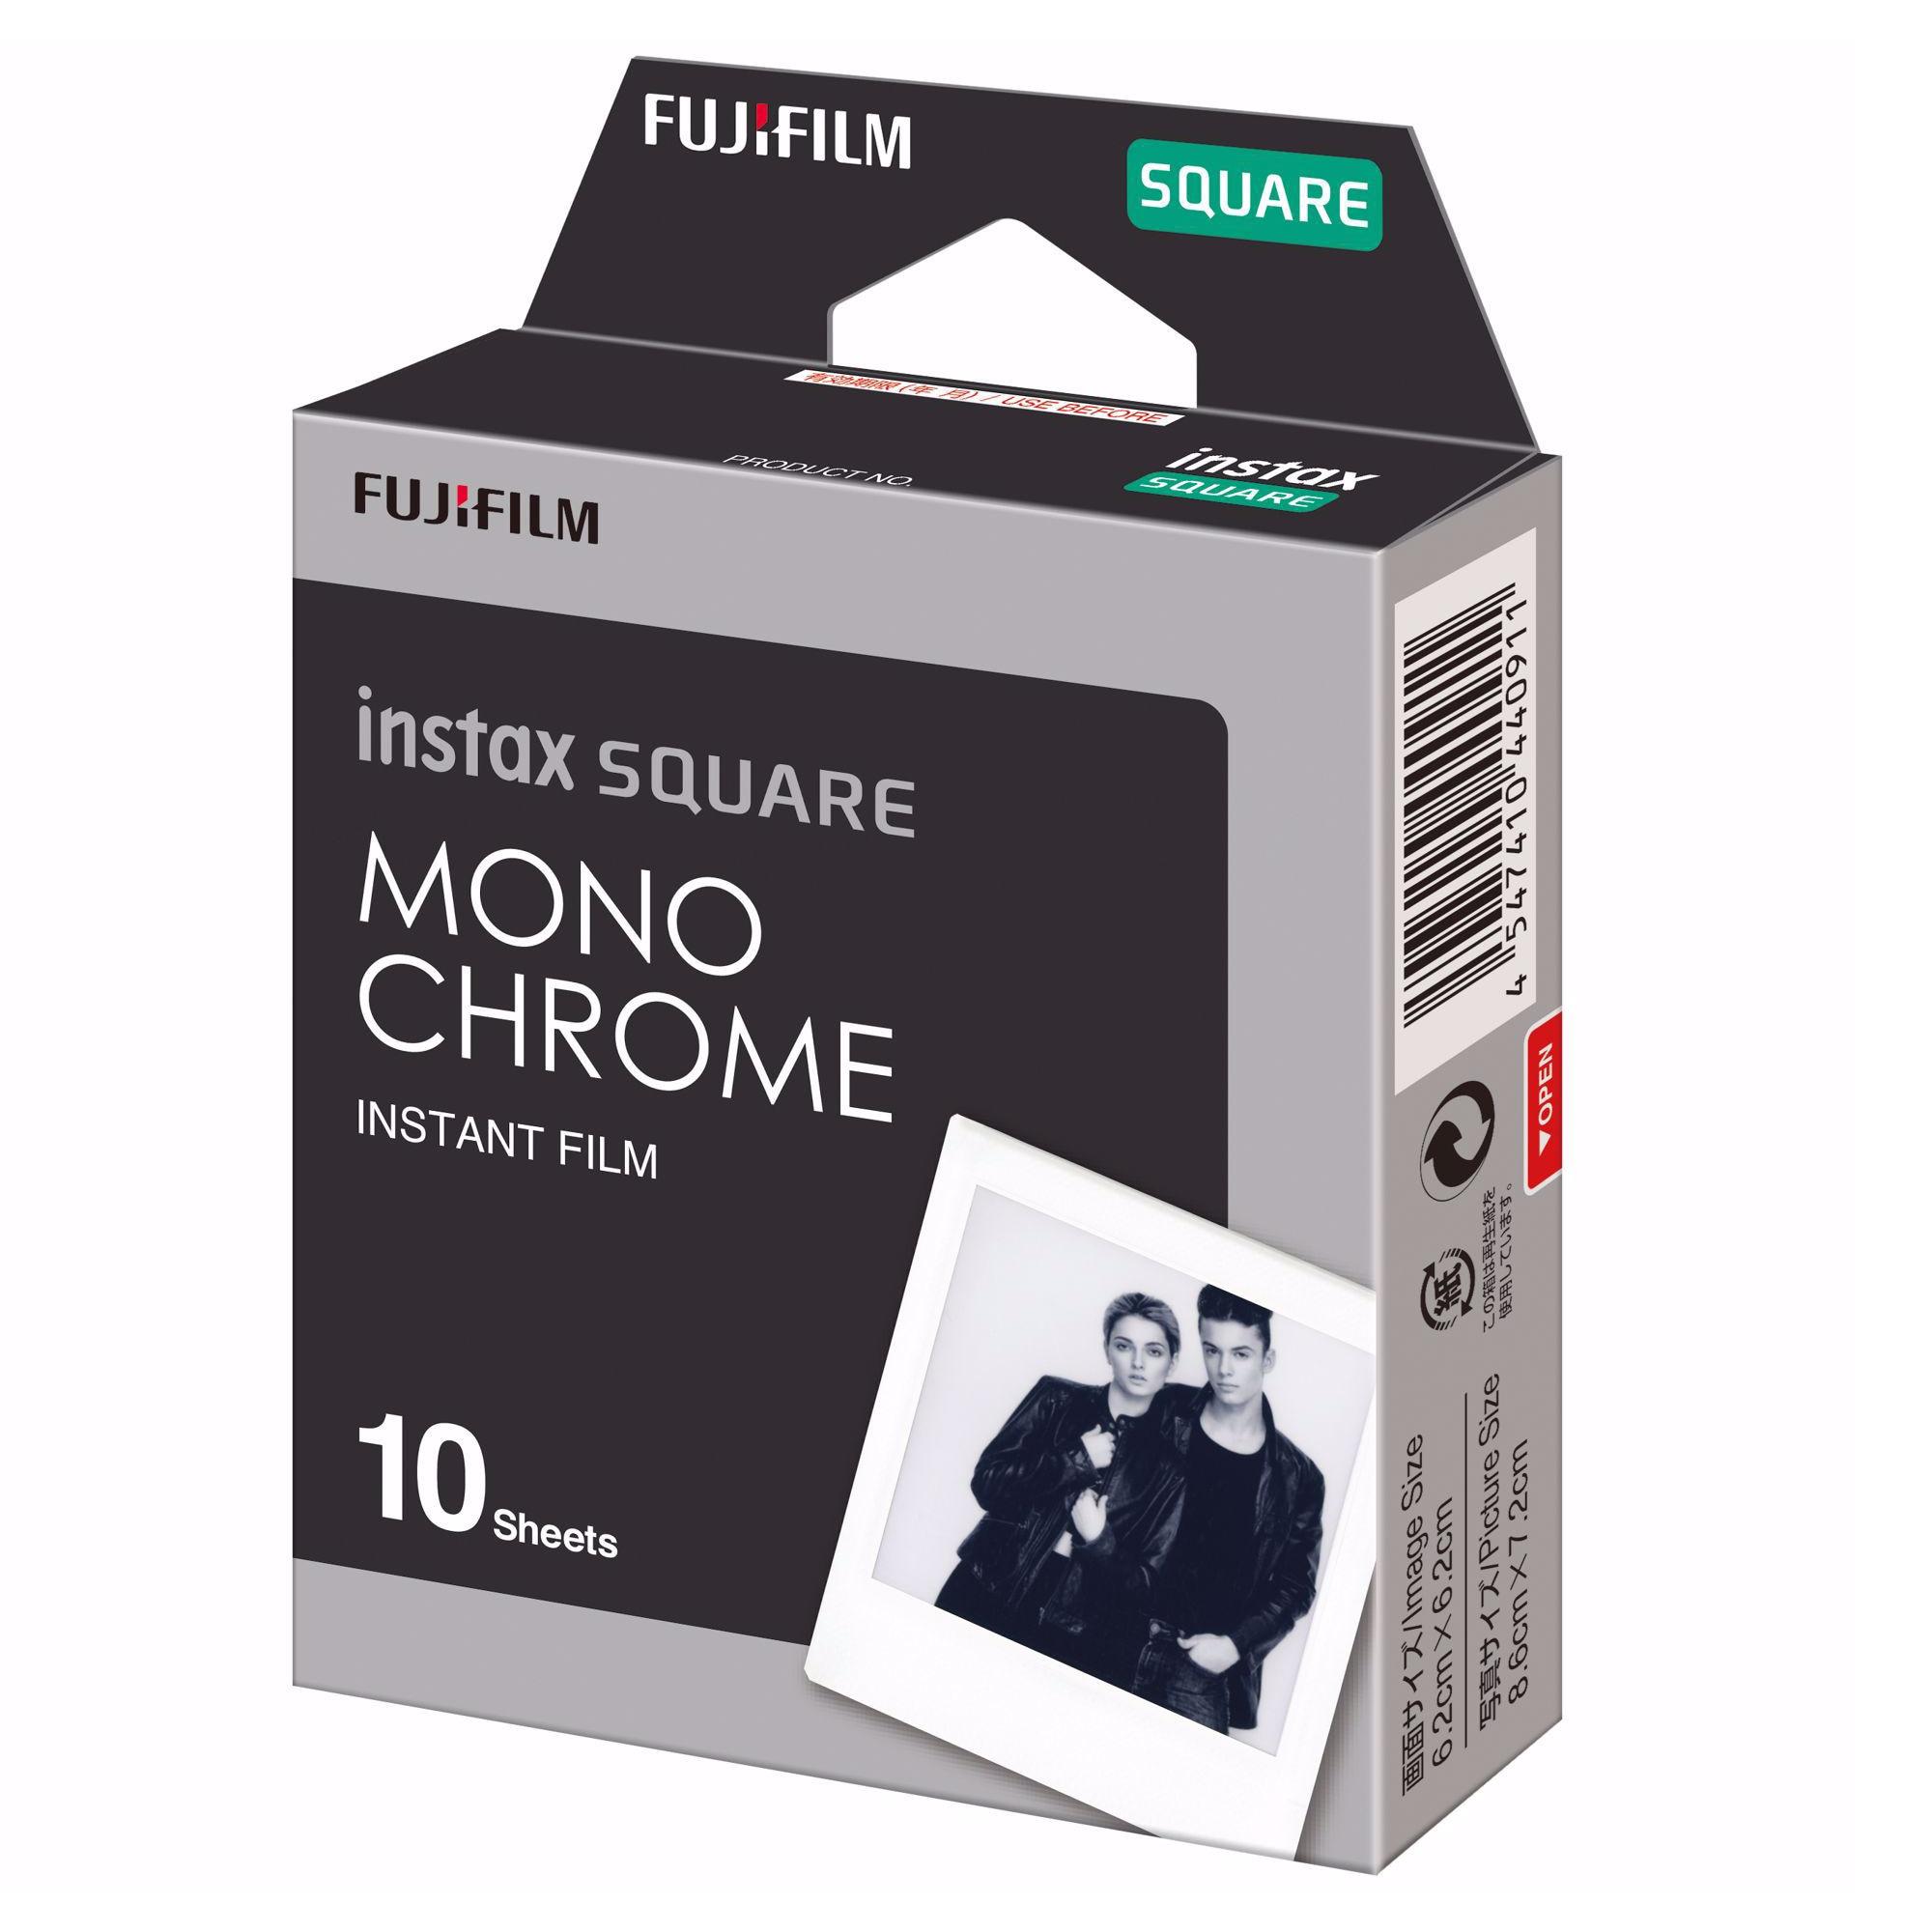 Fujifilm Instax Square Film Monochrome 10st